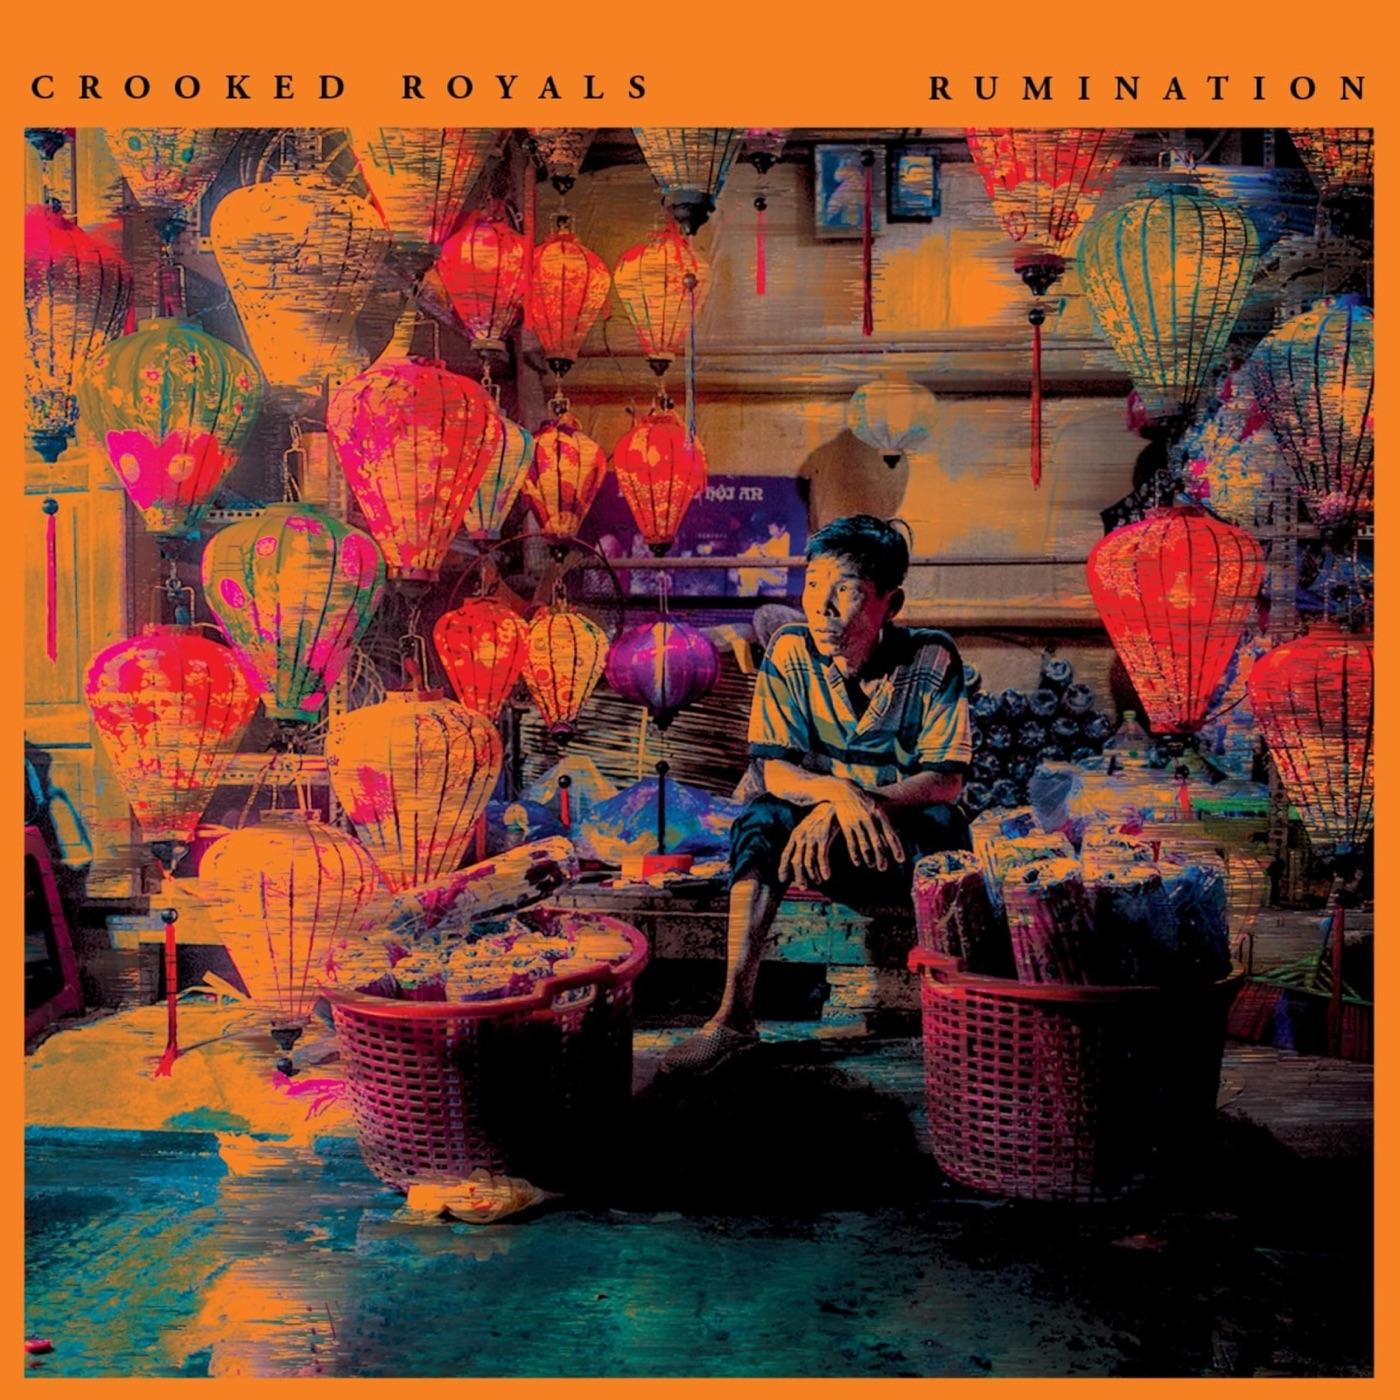 Crooked Royals - Rumination [EP] (2019)